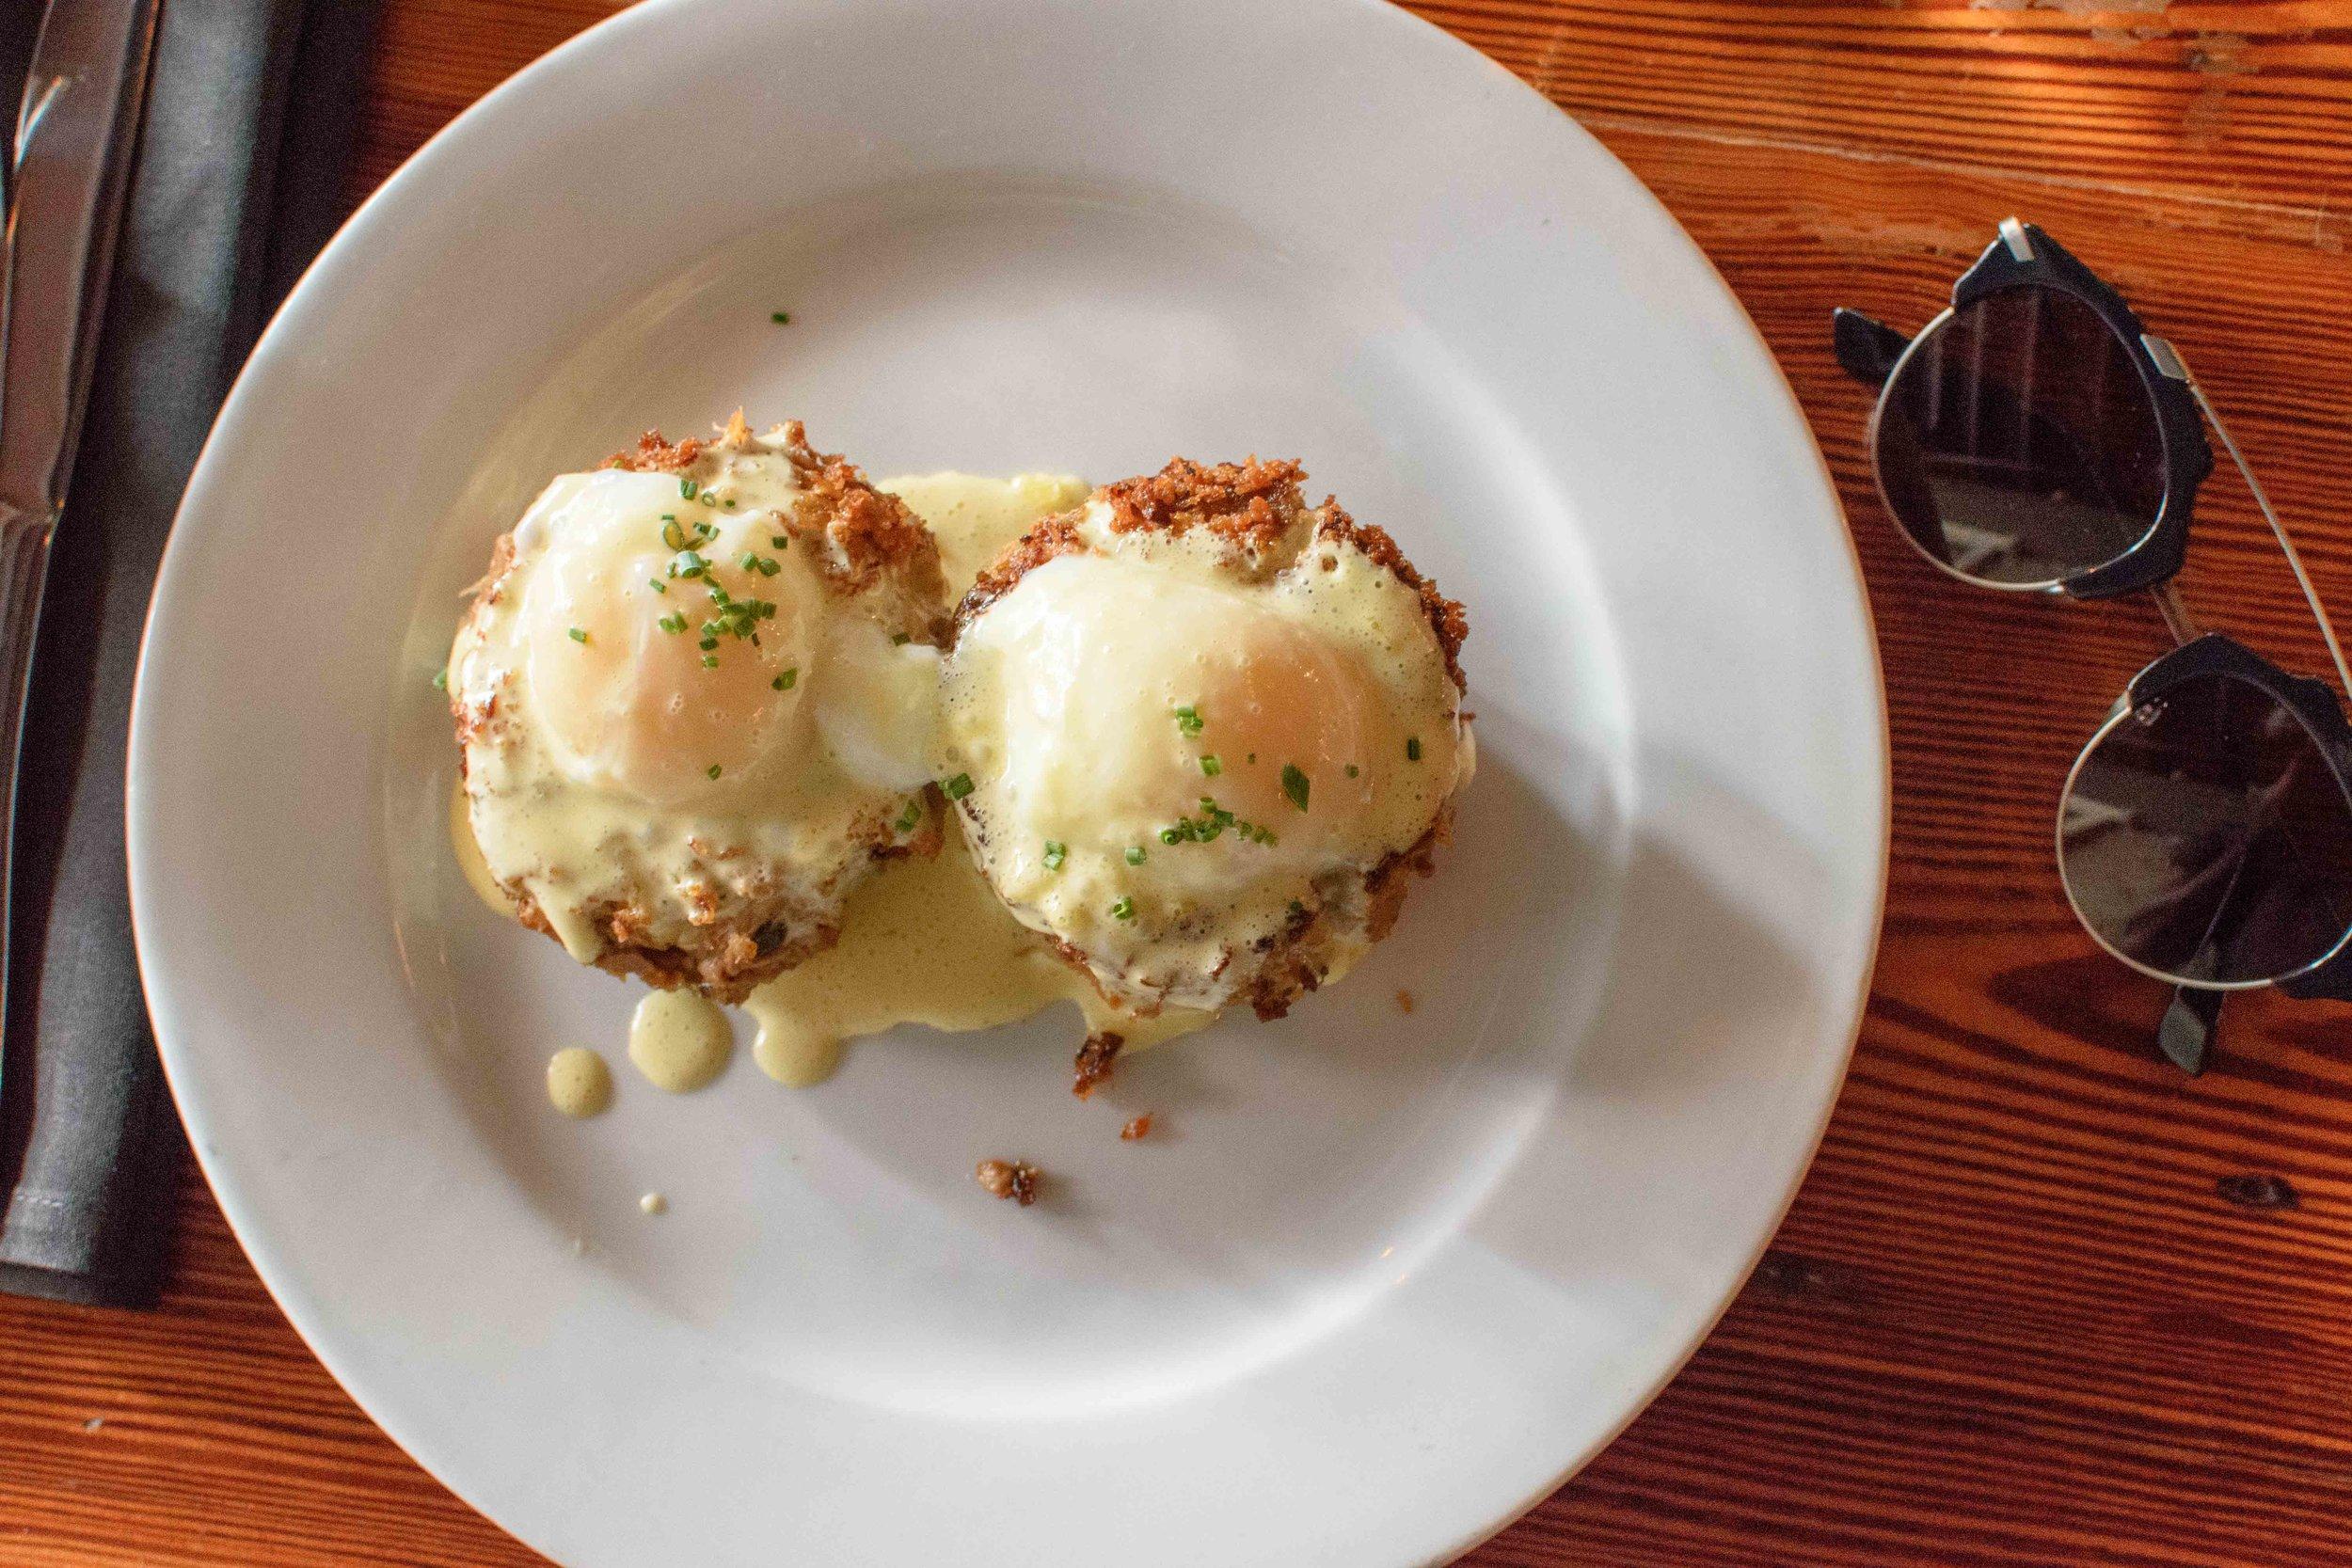 sylvain places to eat in new orleans pork shoulder benedict